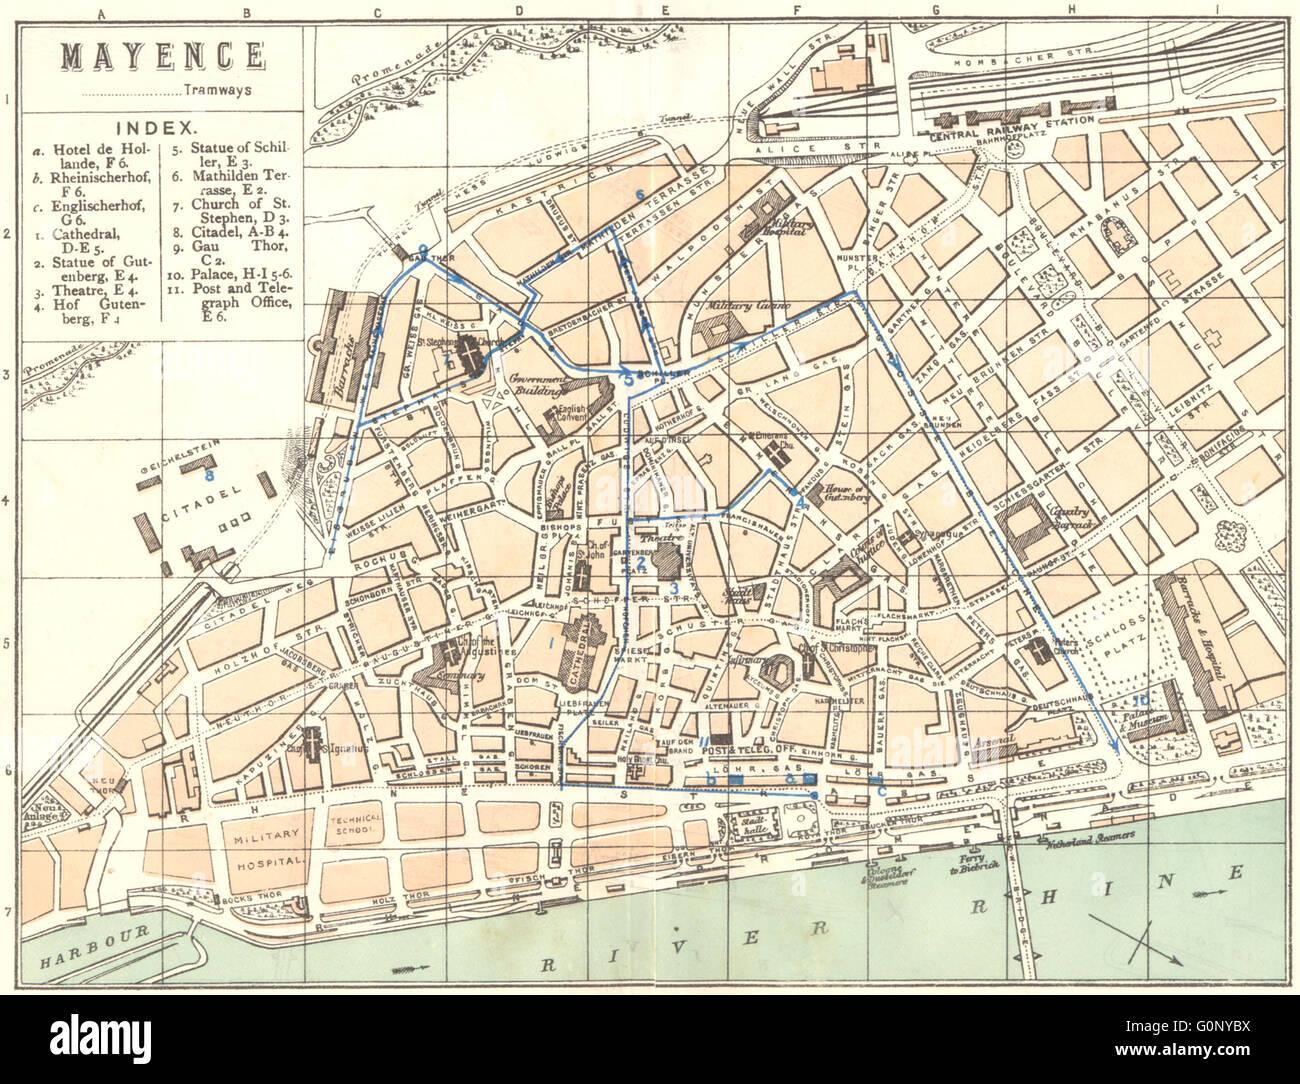 GERMANY Mainz Mayence Antique Map Stock Photo Royalty Free - Germany map mainz